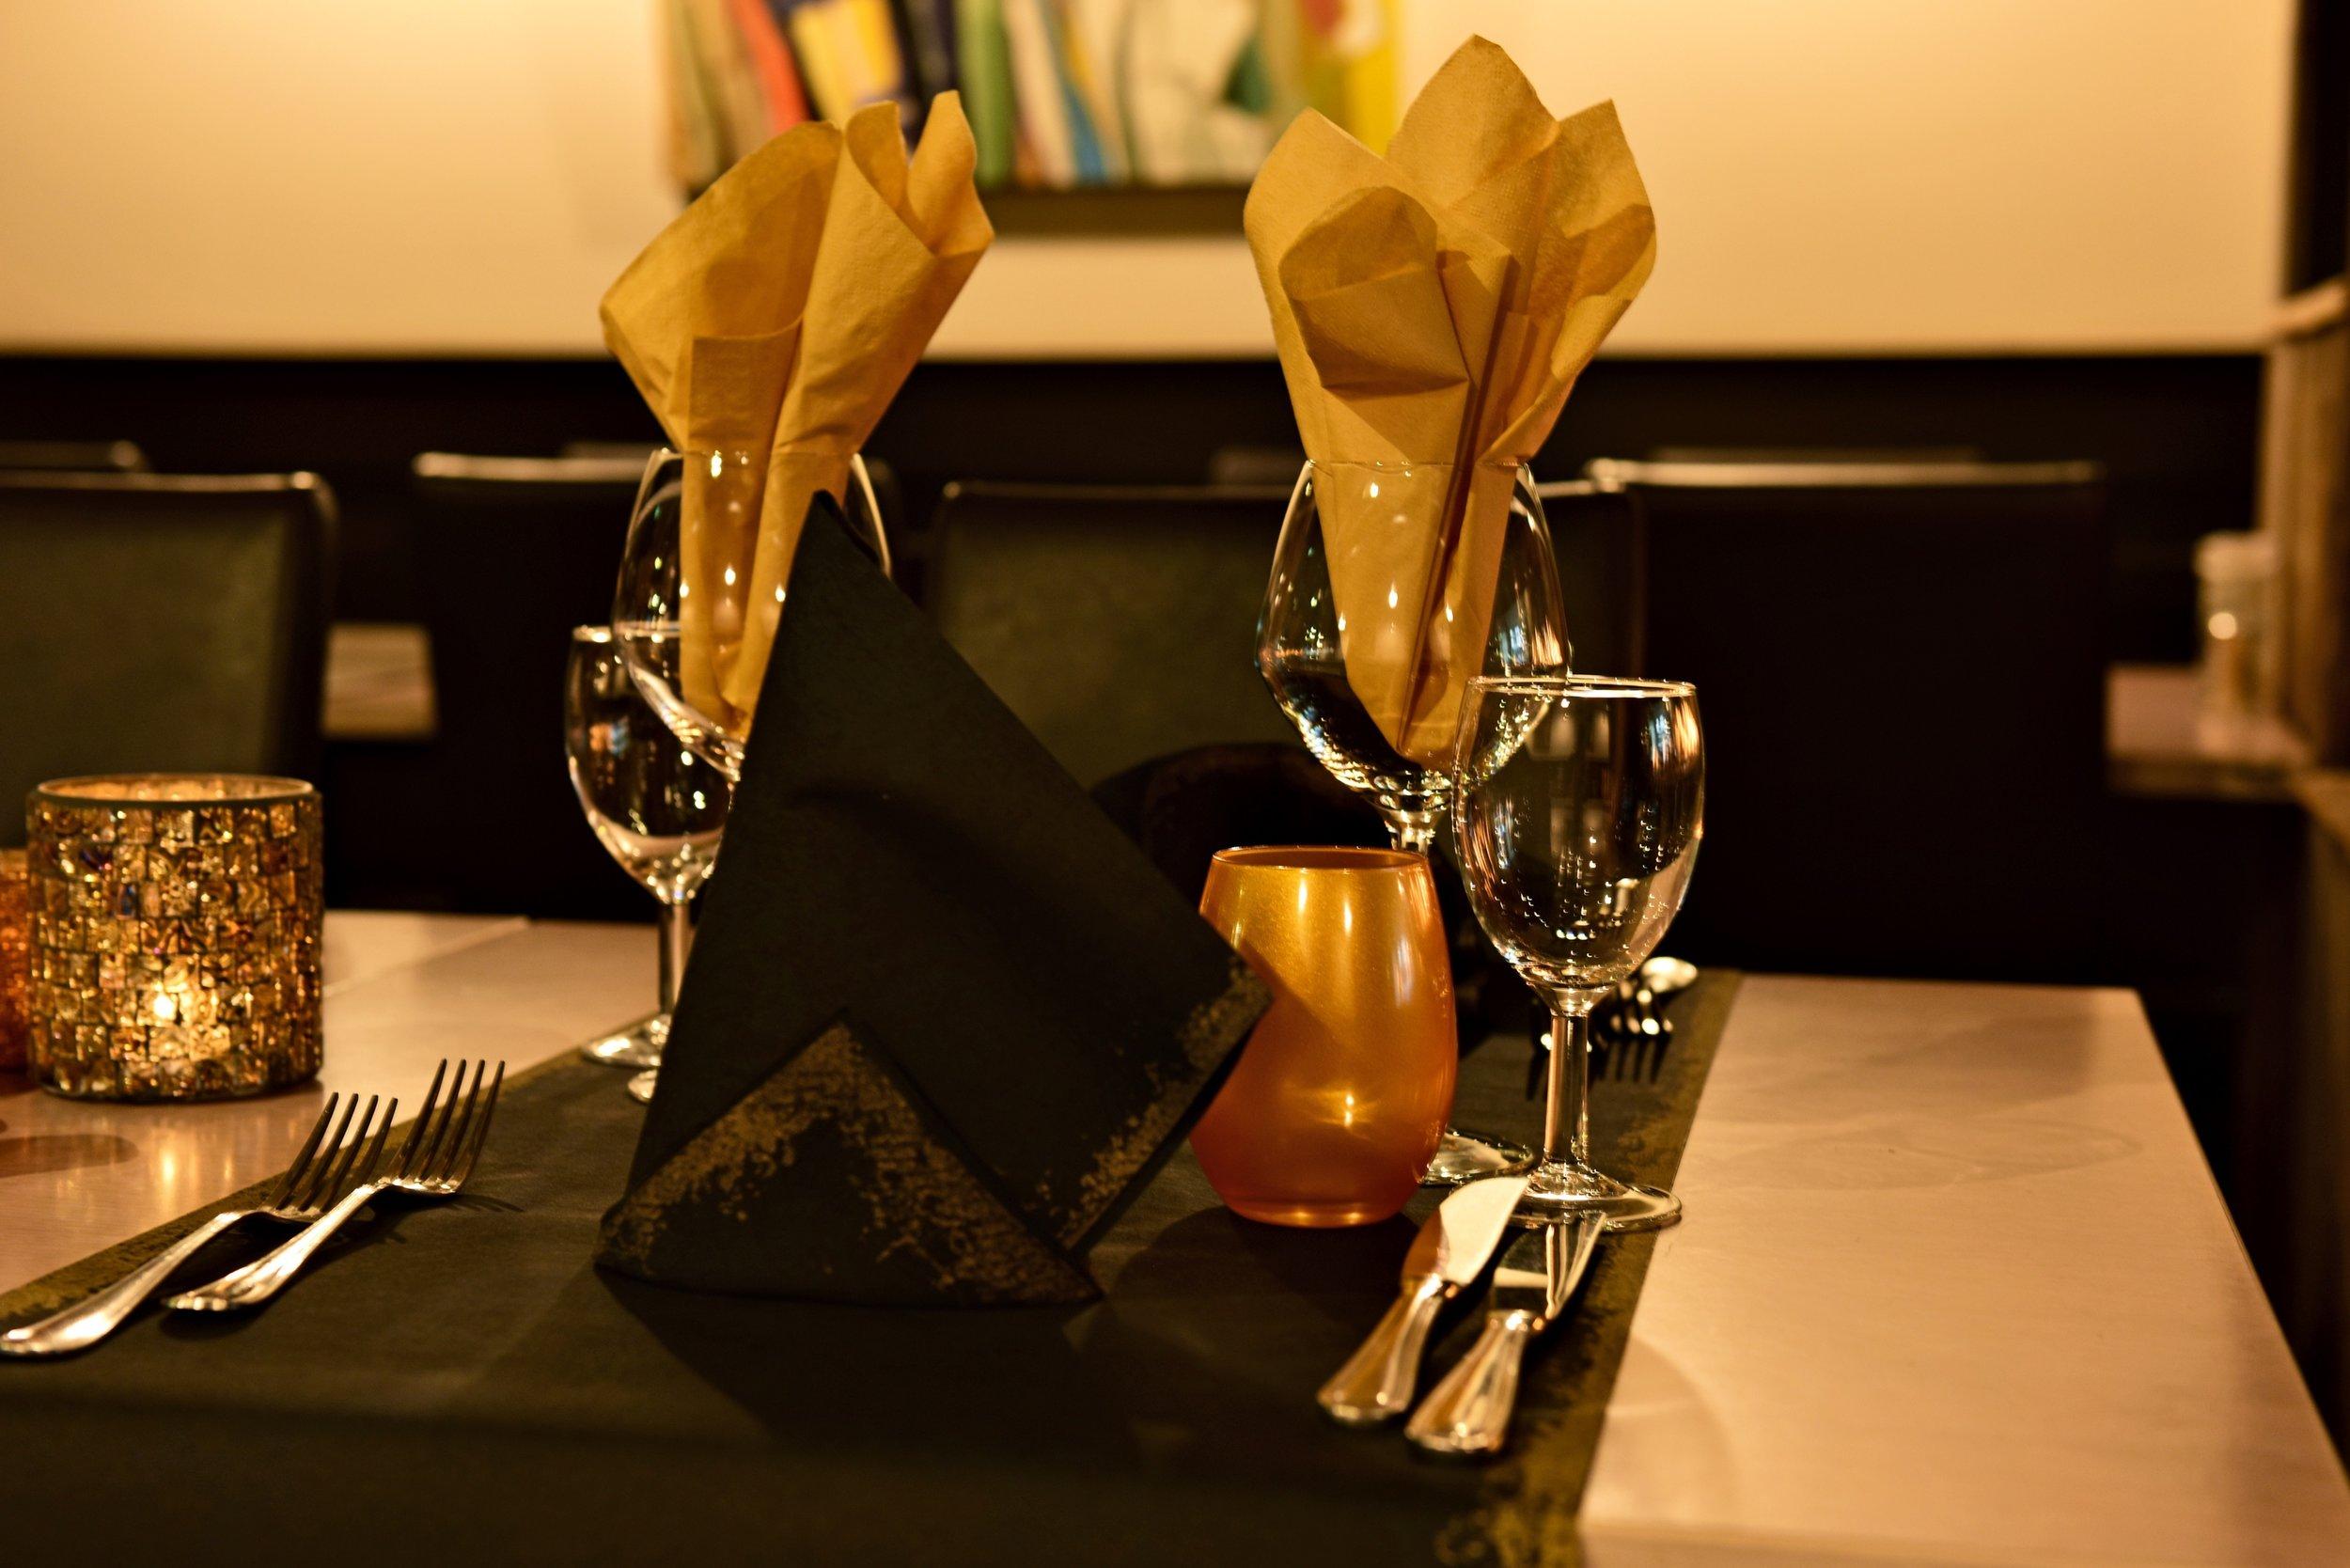 10 restuarant brasserie t filet purreke pureke aalst steak pur tablefever .jpg